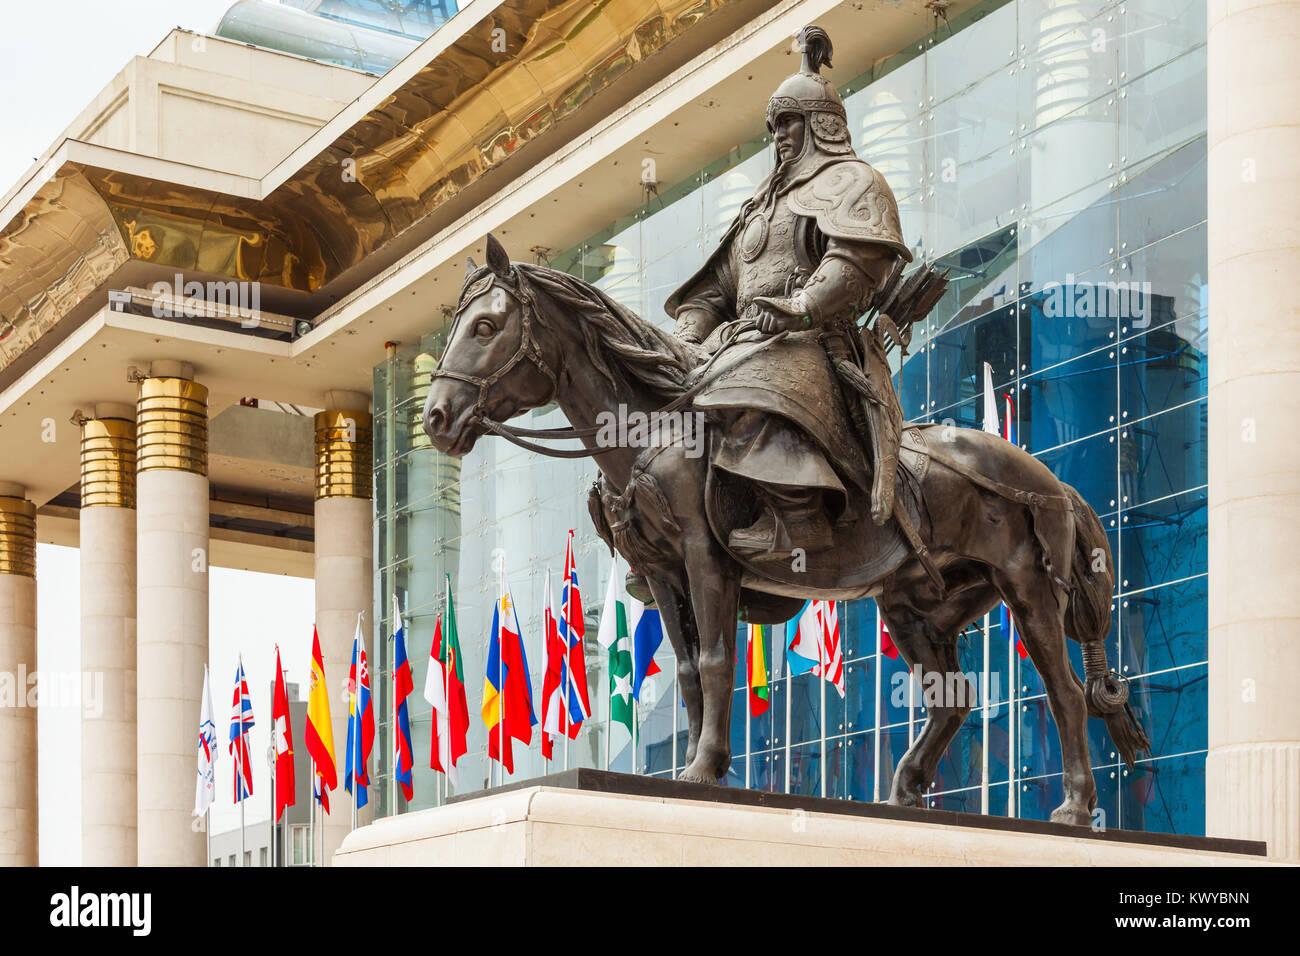 Genghis Khan statue at Chinggis Square (Sukhbaatar Square) in Ulaanbaatar, Mongolia - Stock Image